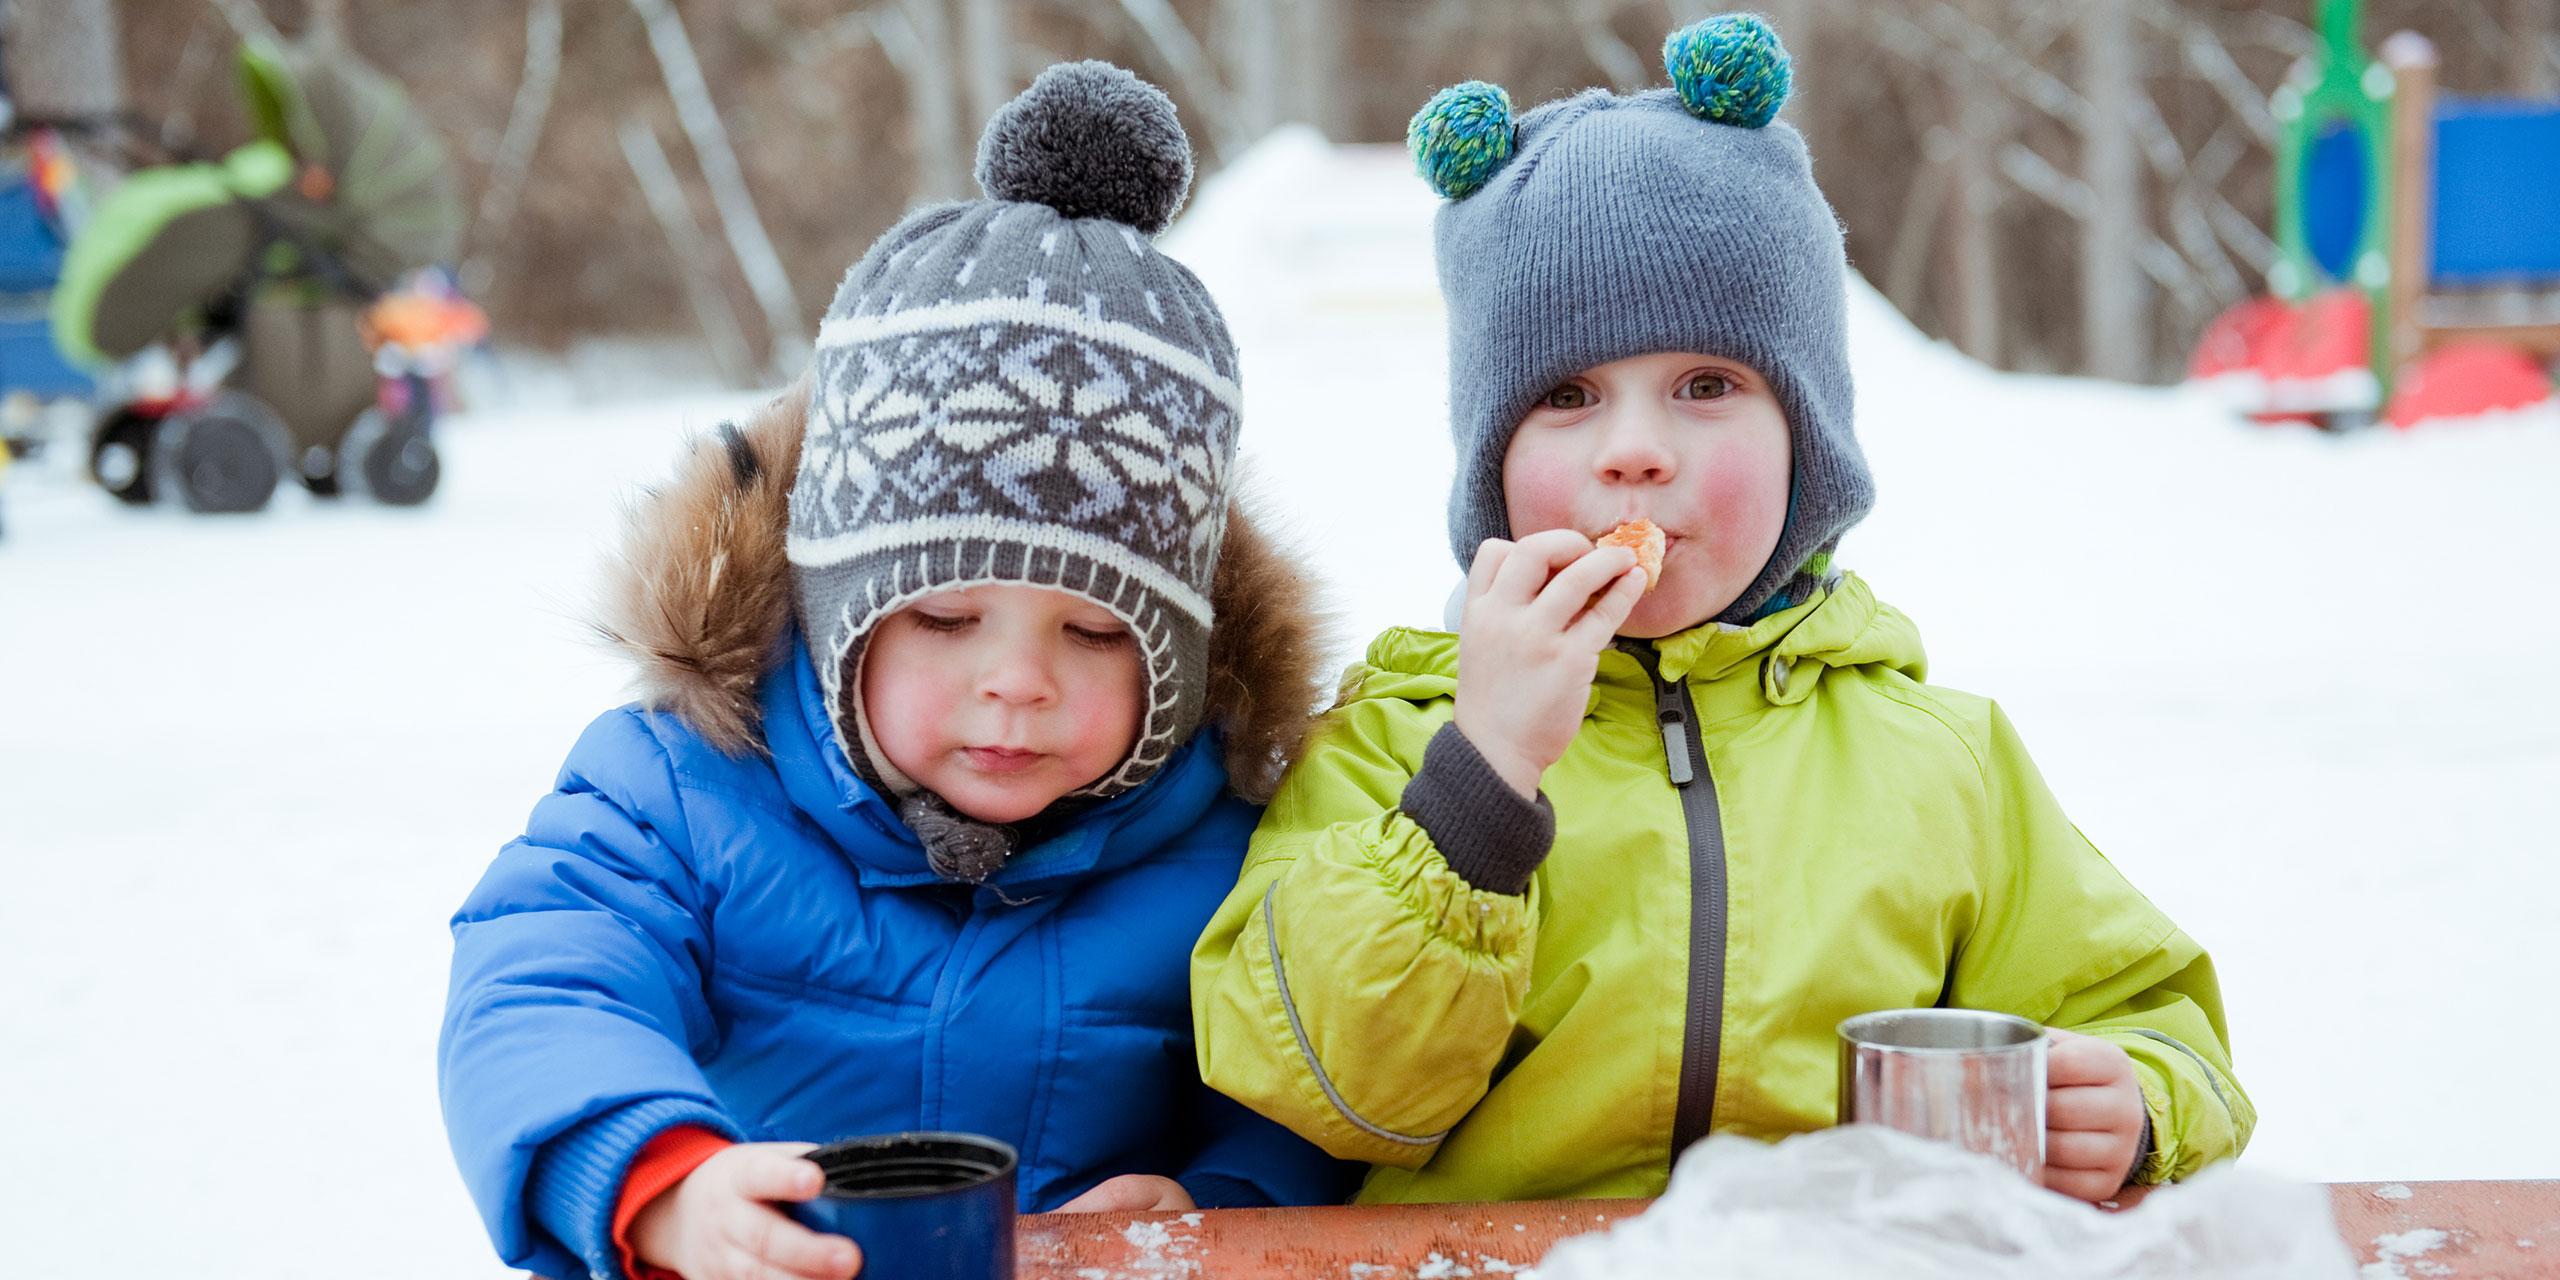 Little Boys Sipping Hot Cocoa; Courtesy of mamaza/Shutterstock.com